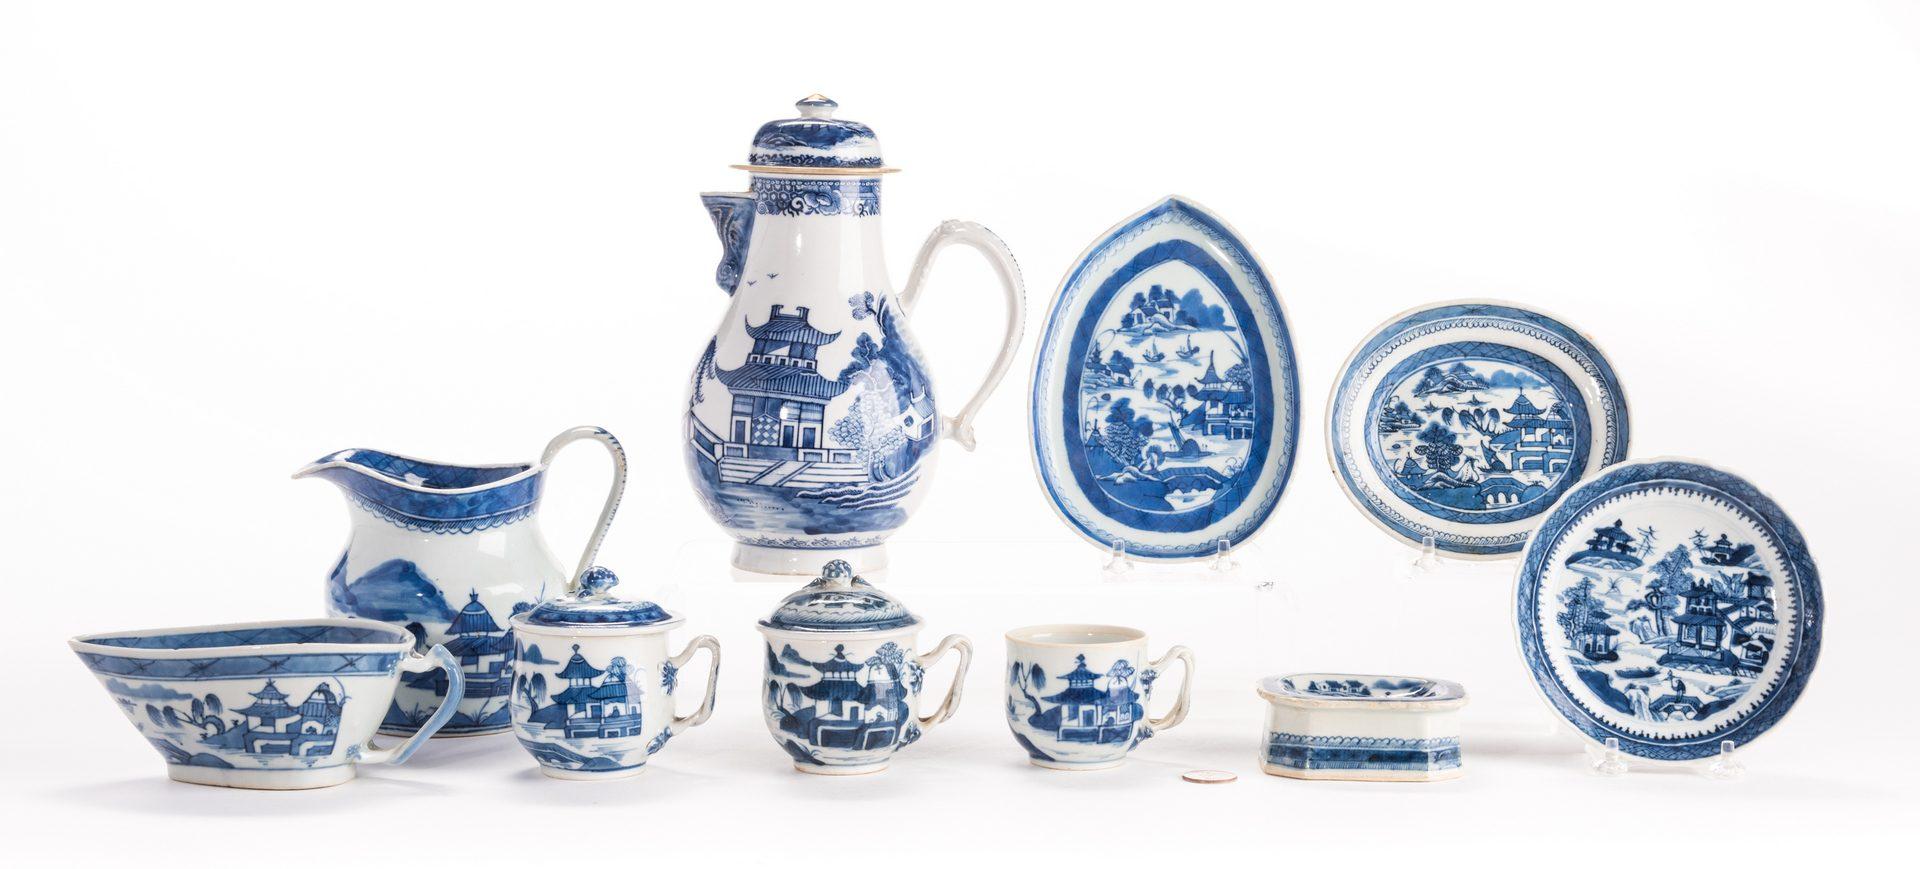 Lot 312: Chinese Export Porcelain, 12 pcs inc. coffeepot